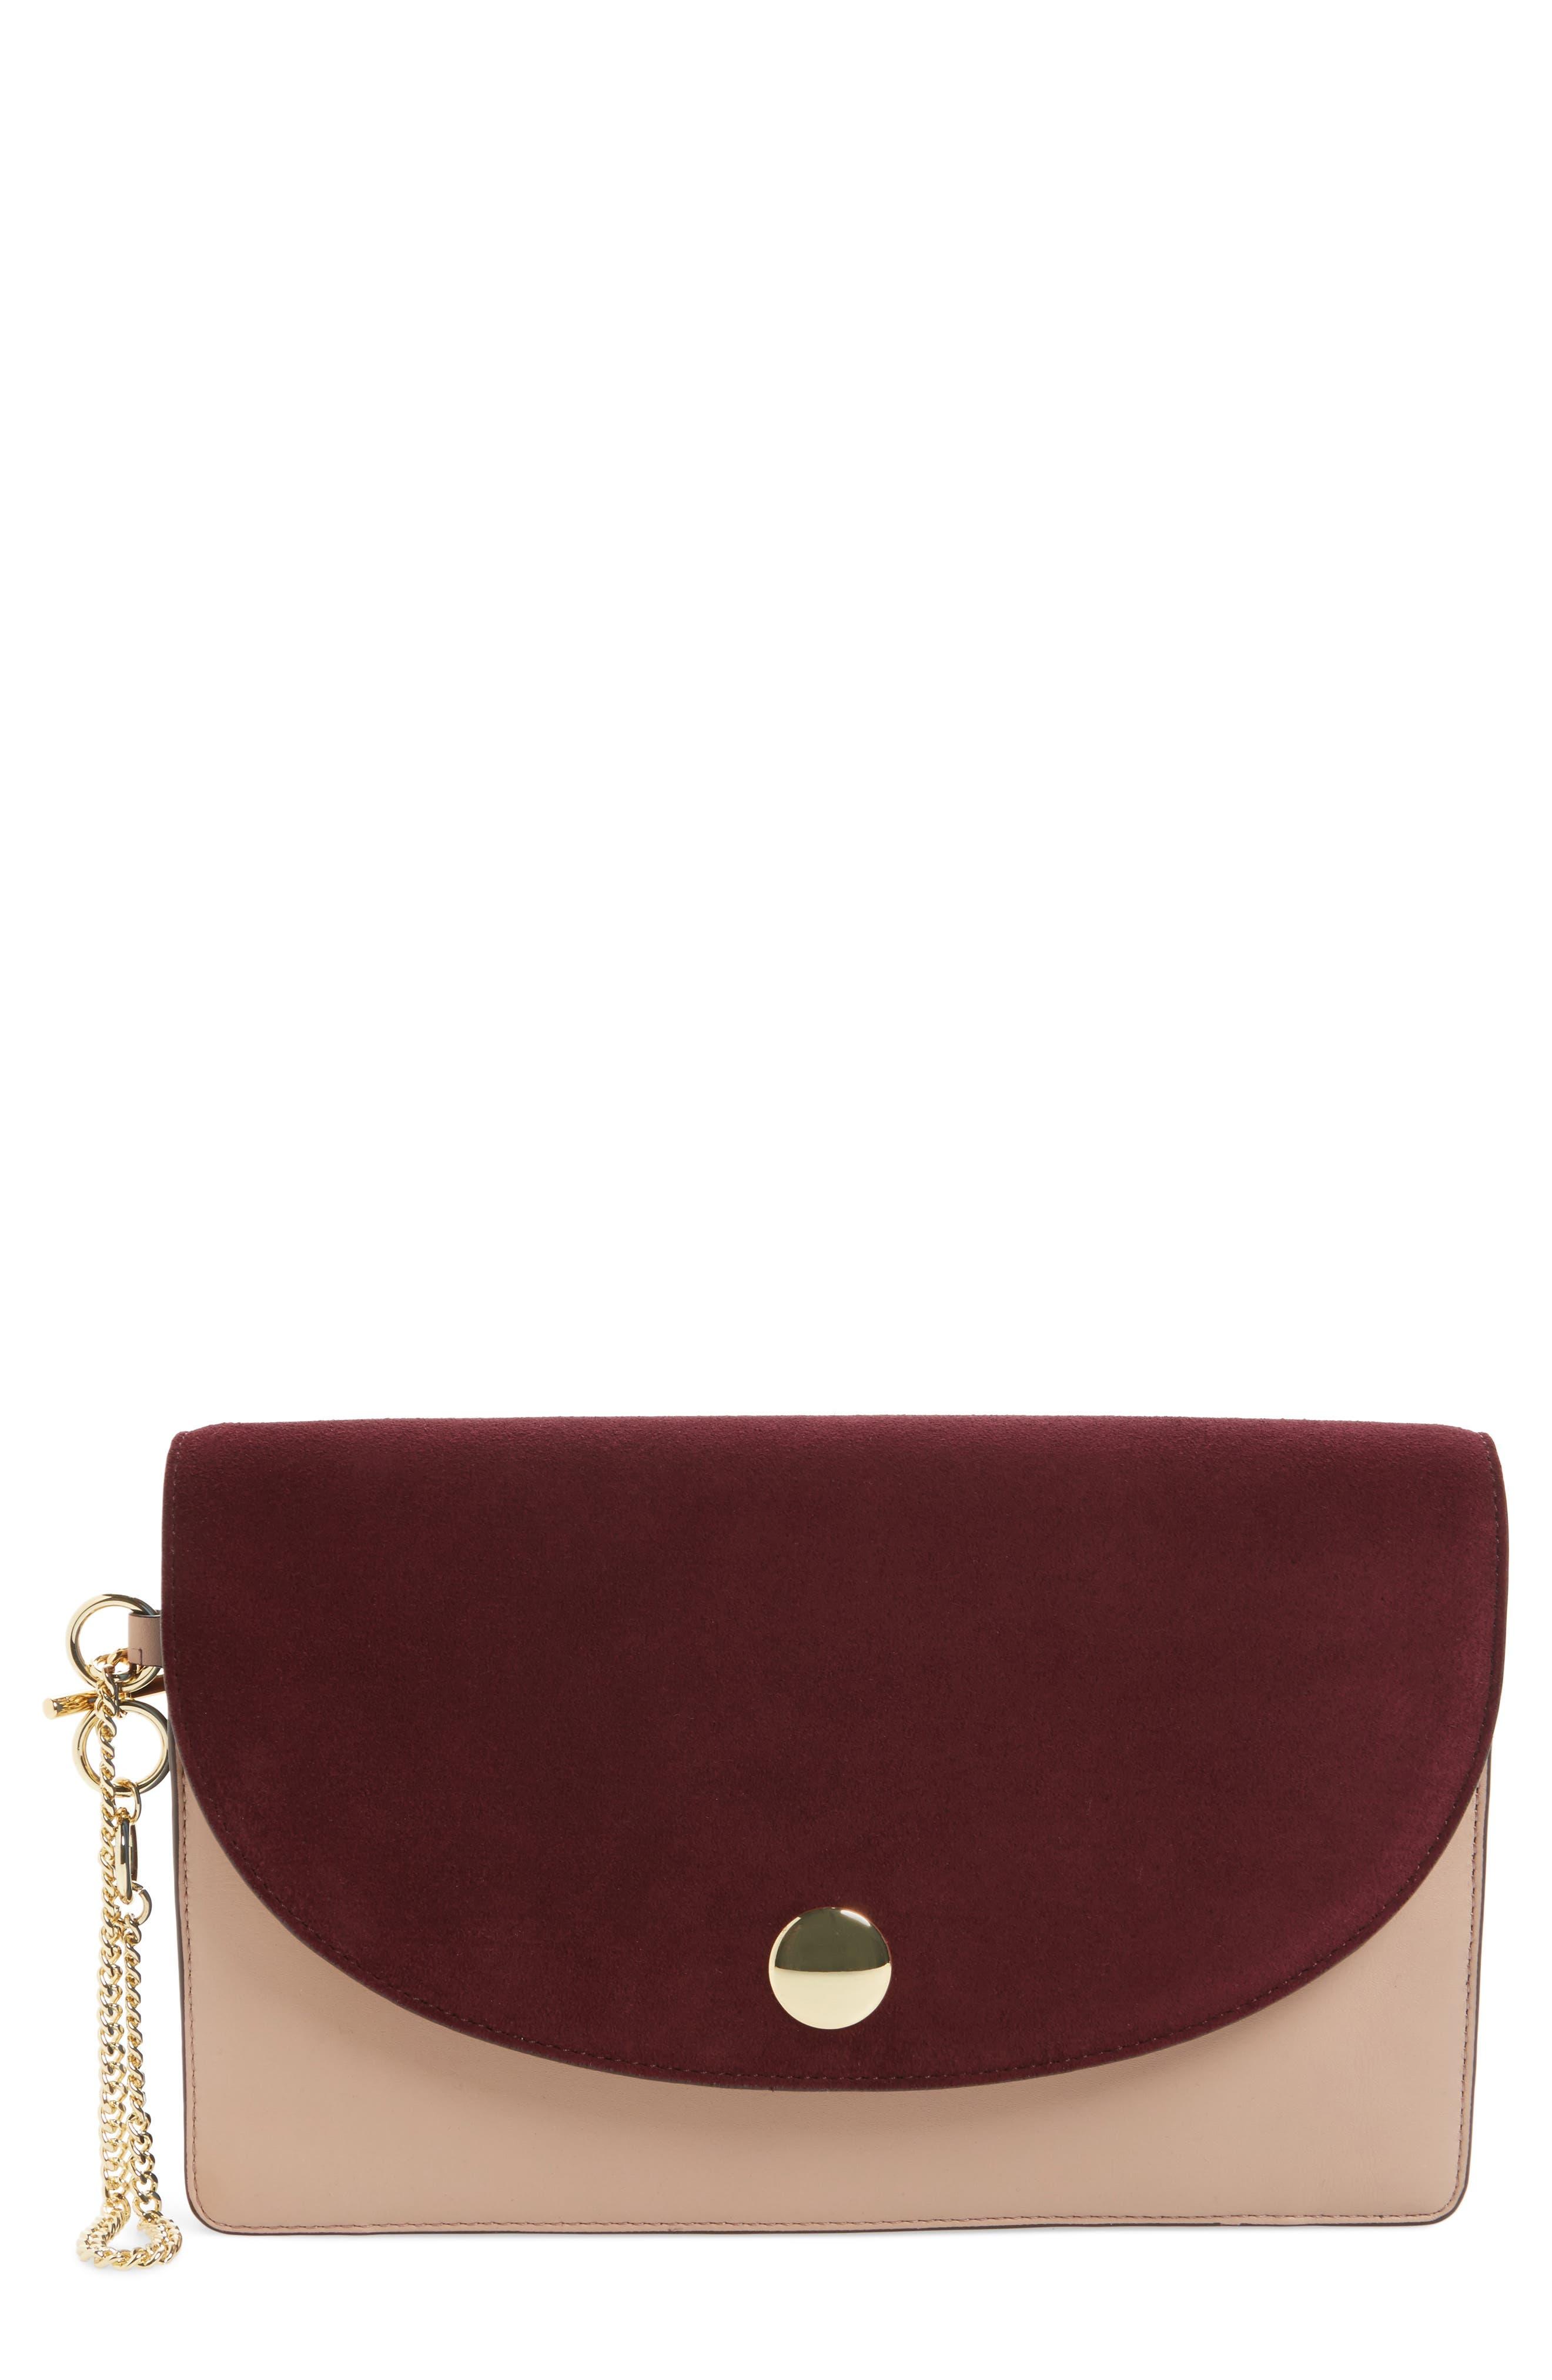 Convertible Leather Saddle Clutch,                         Main,                         color, Bordeaux/ Dusty Pink